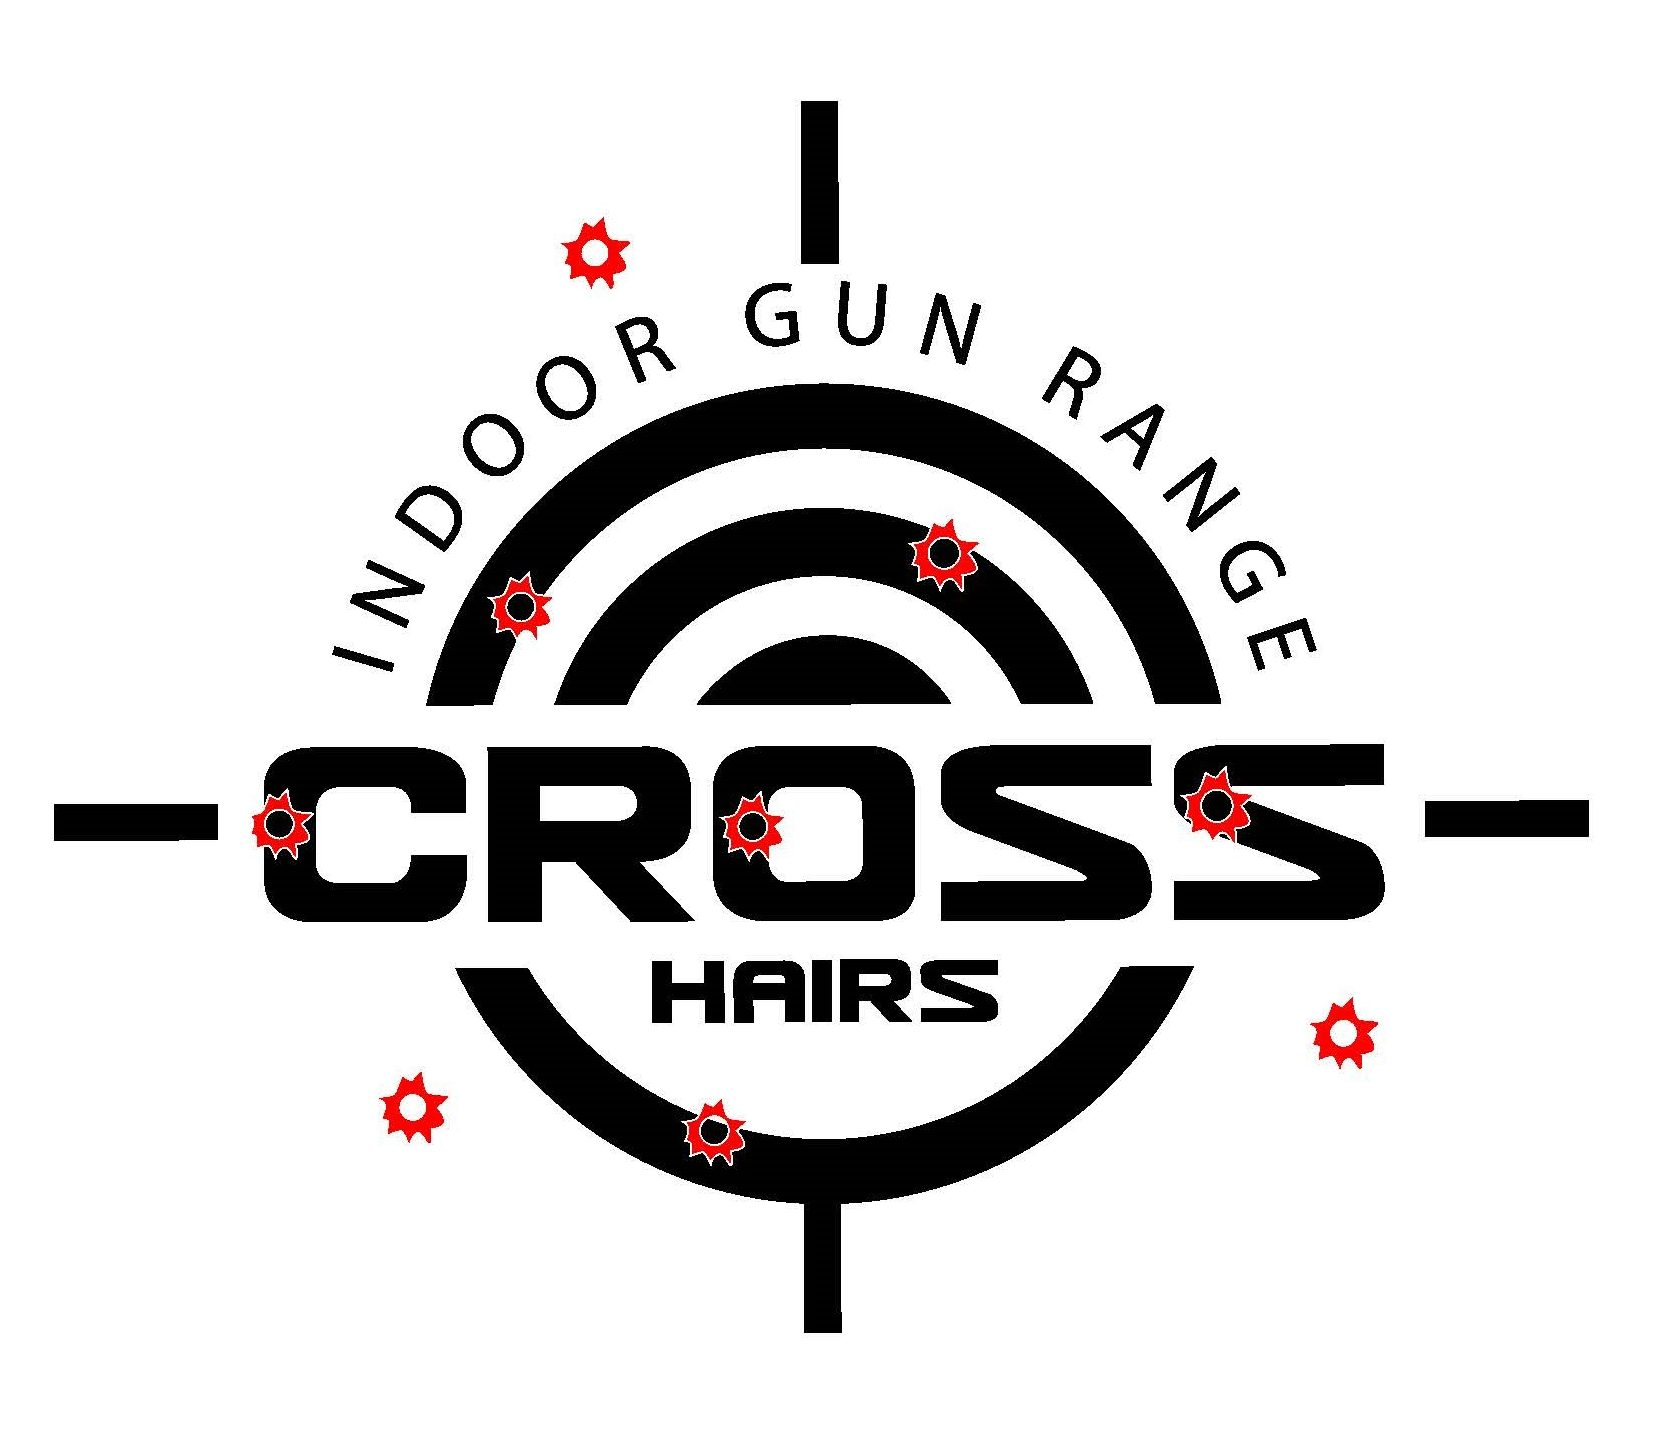 West Virginia Concealed Handgun License Course Cross